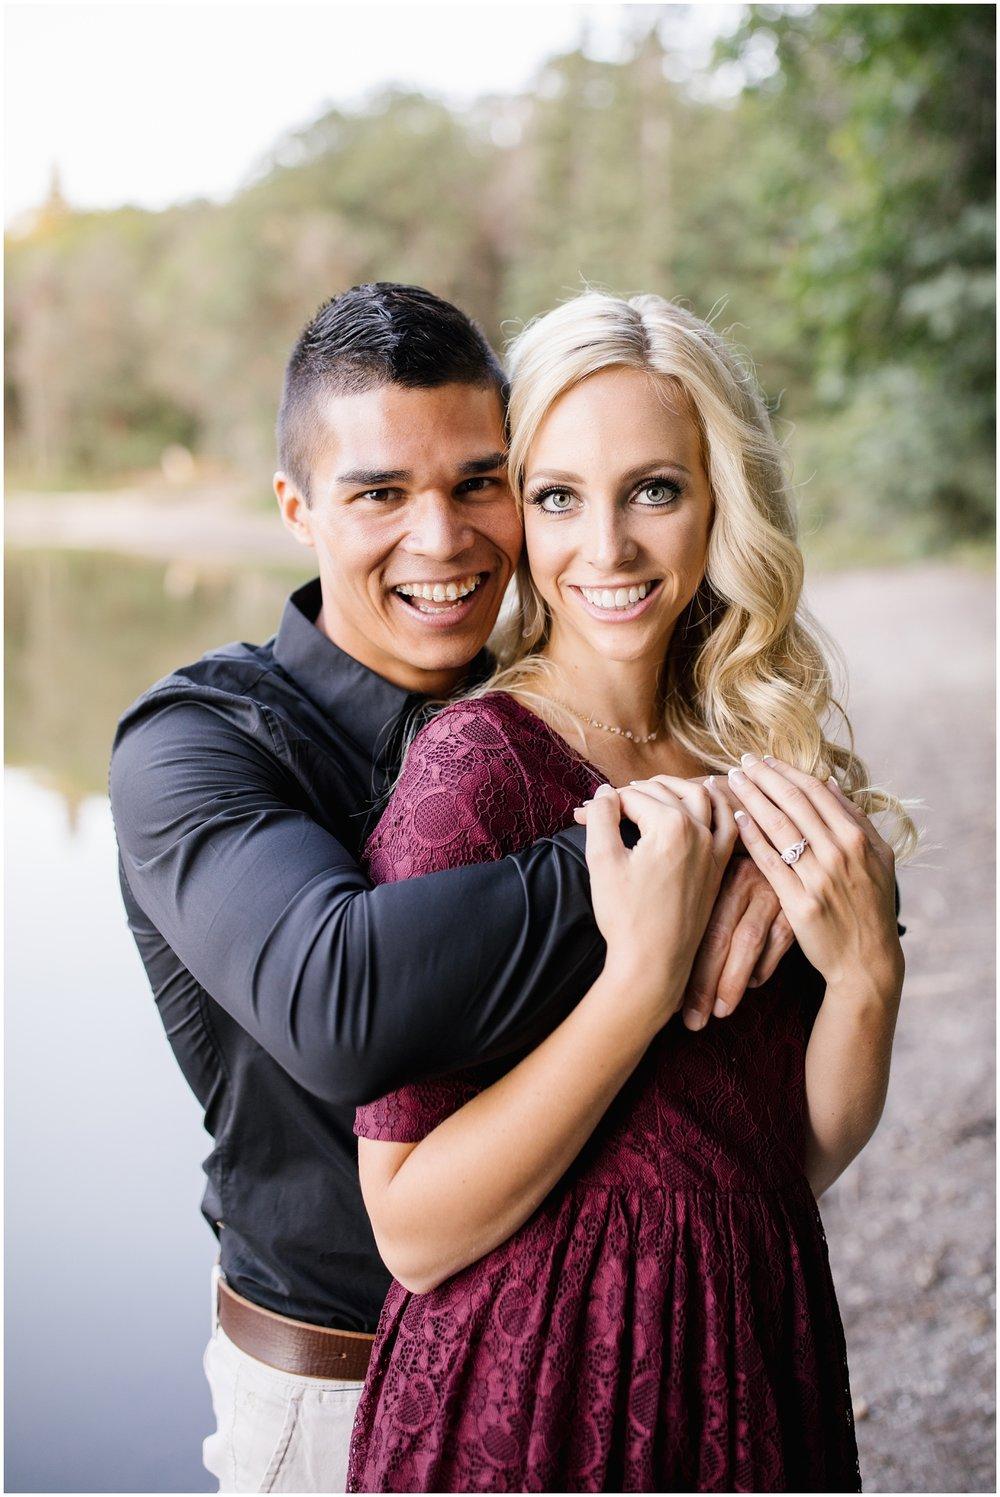 HCengagements-72_Lizzie-B-Imagery-Utah-Wedding-Photographer-Park-City-Salt-Lake-City-Payson-Canyon-Engagement-Session.jpg